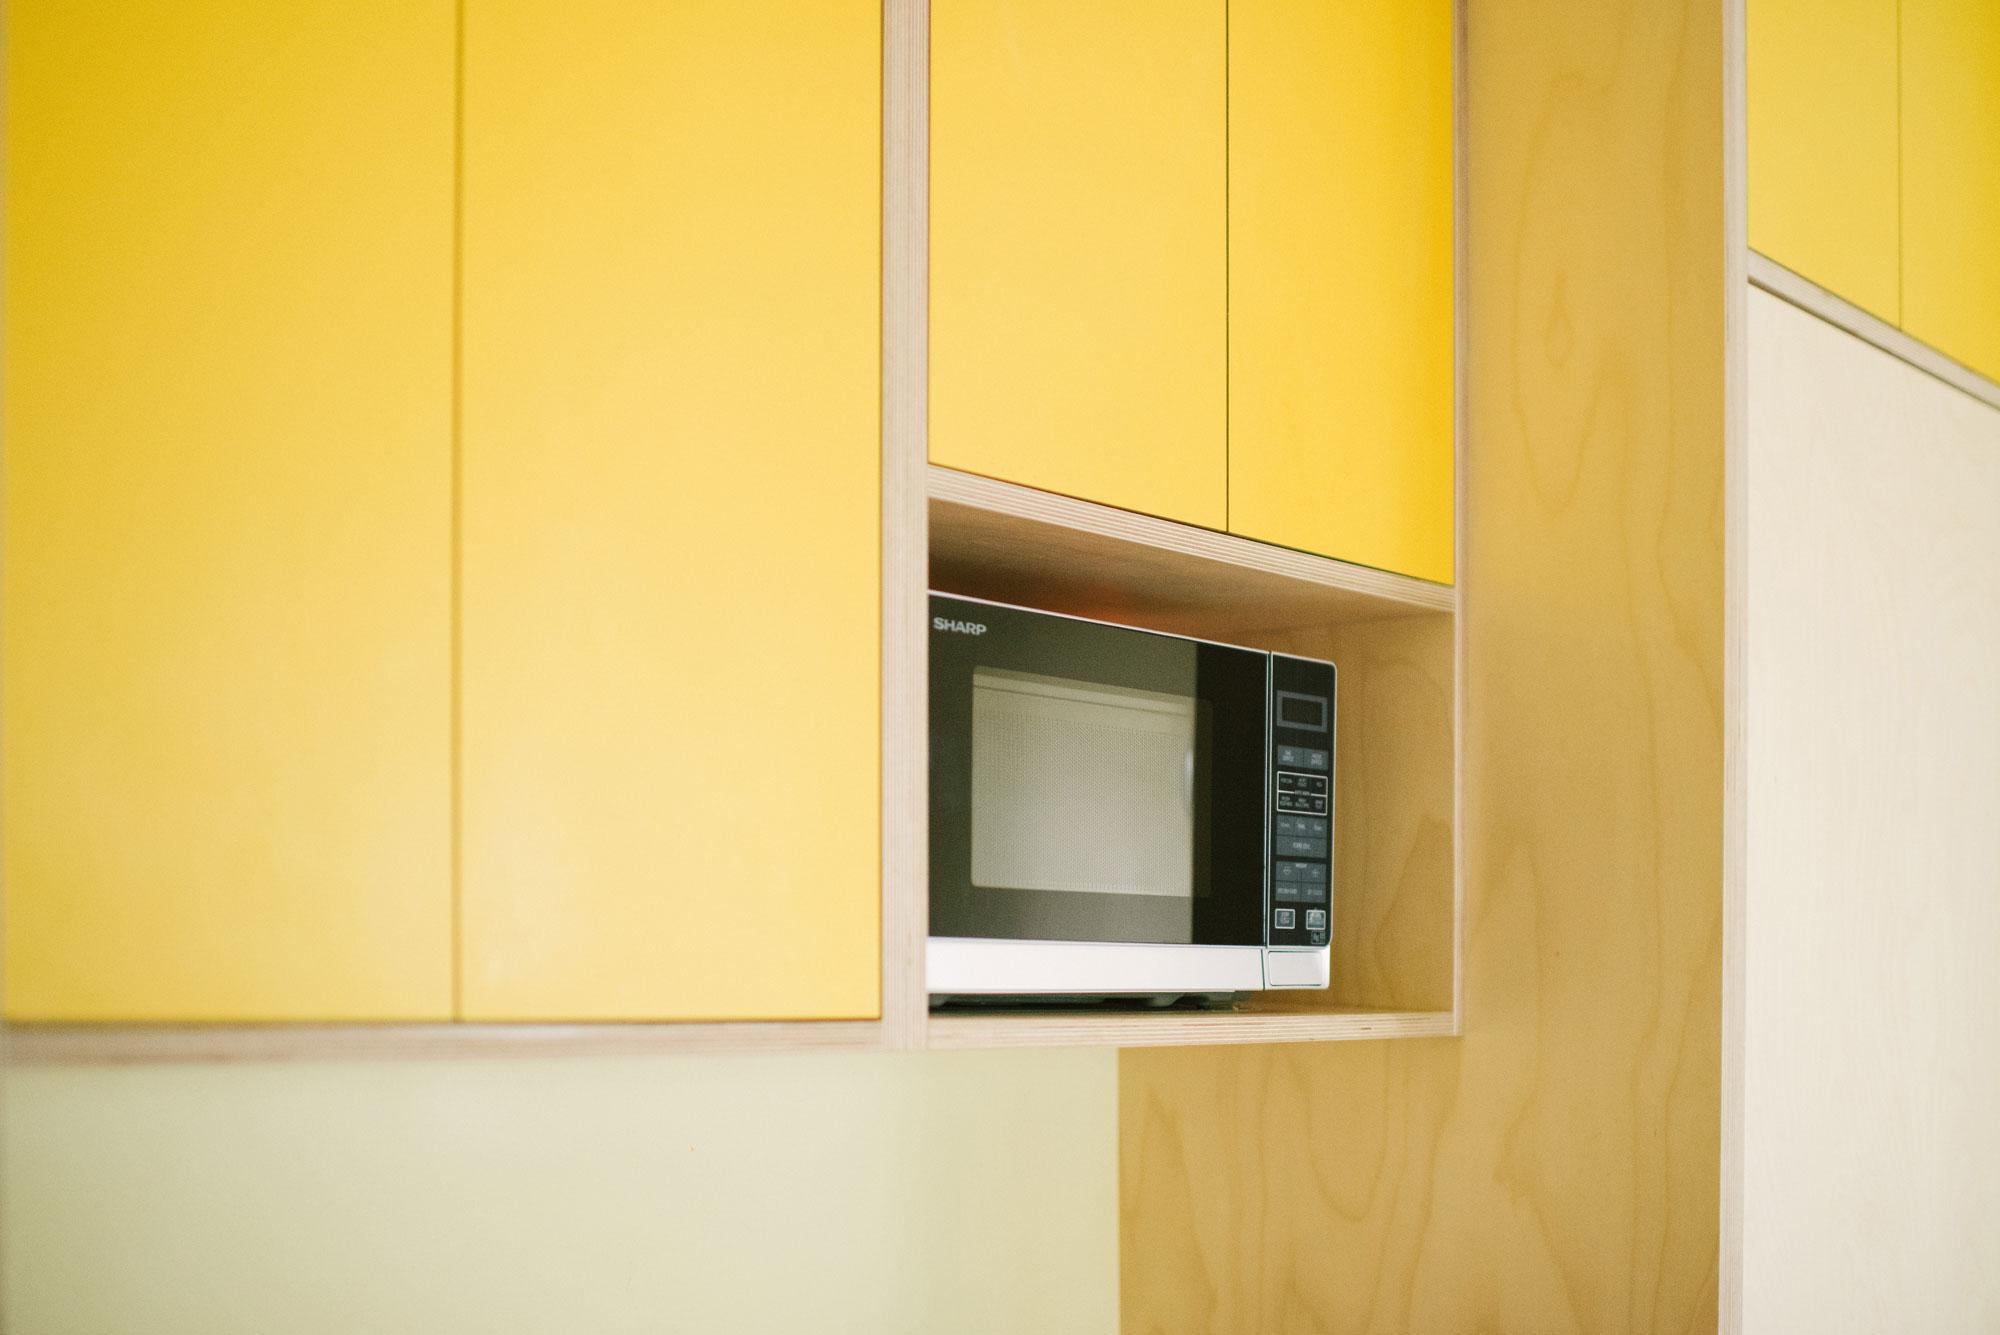 Microwave Housing